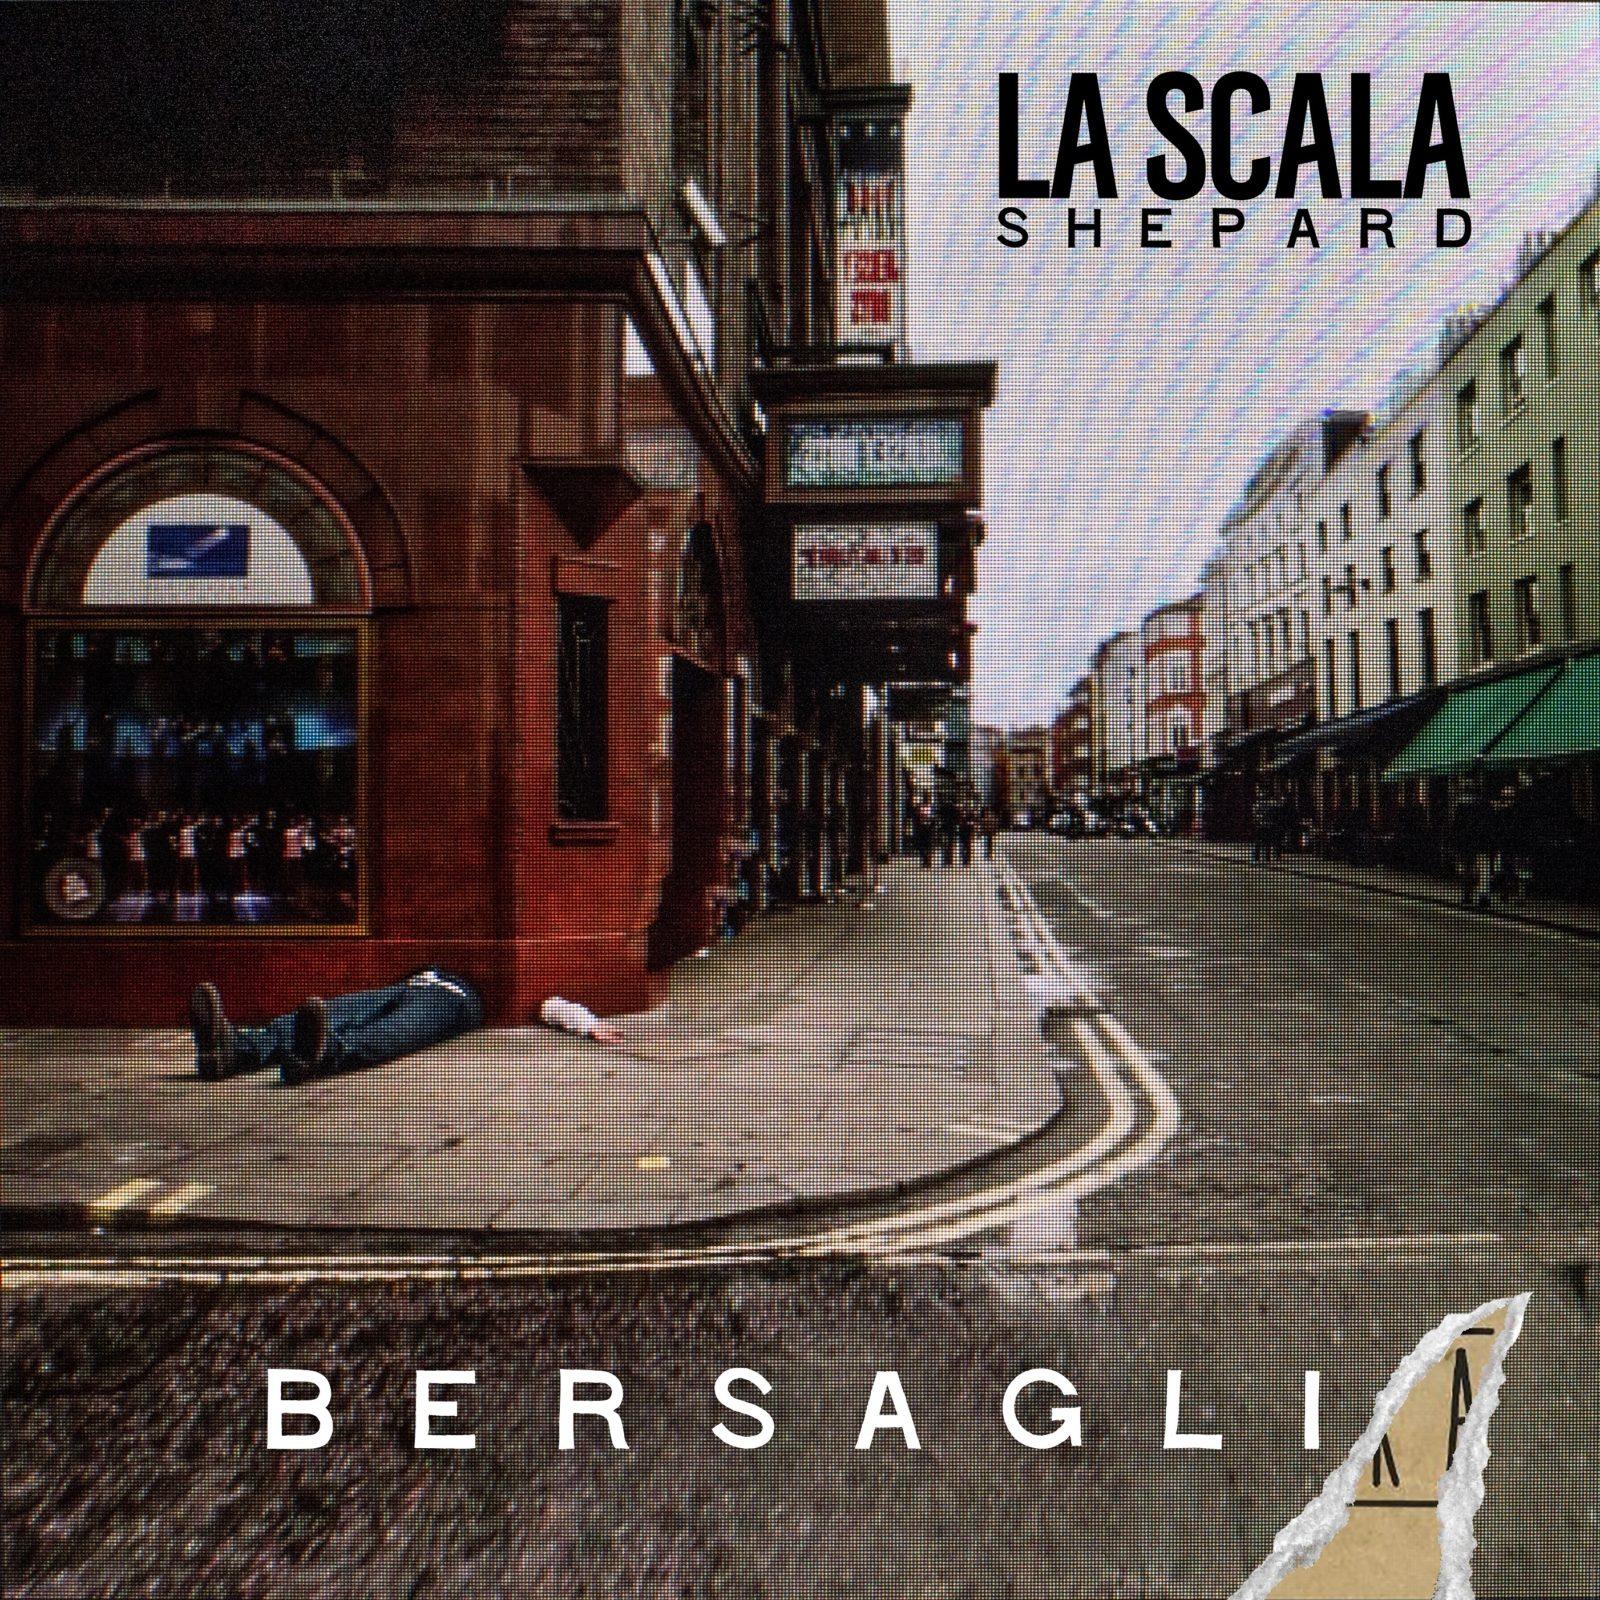 lascalashepard BERSAGLI